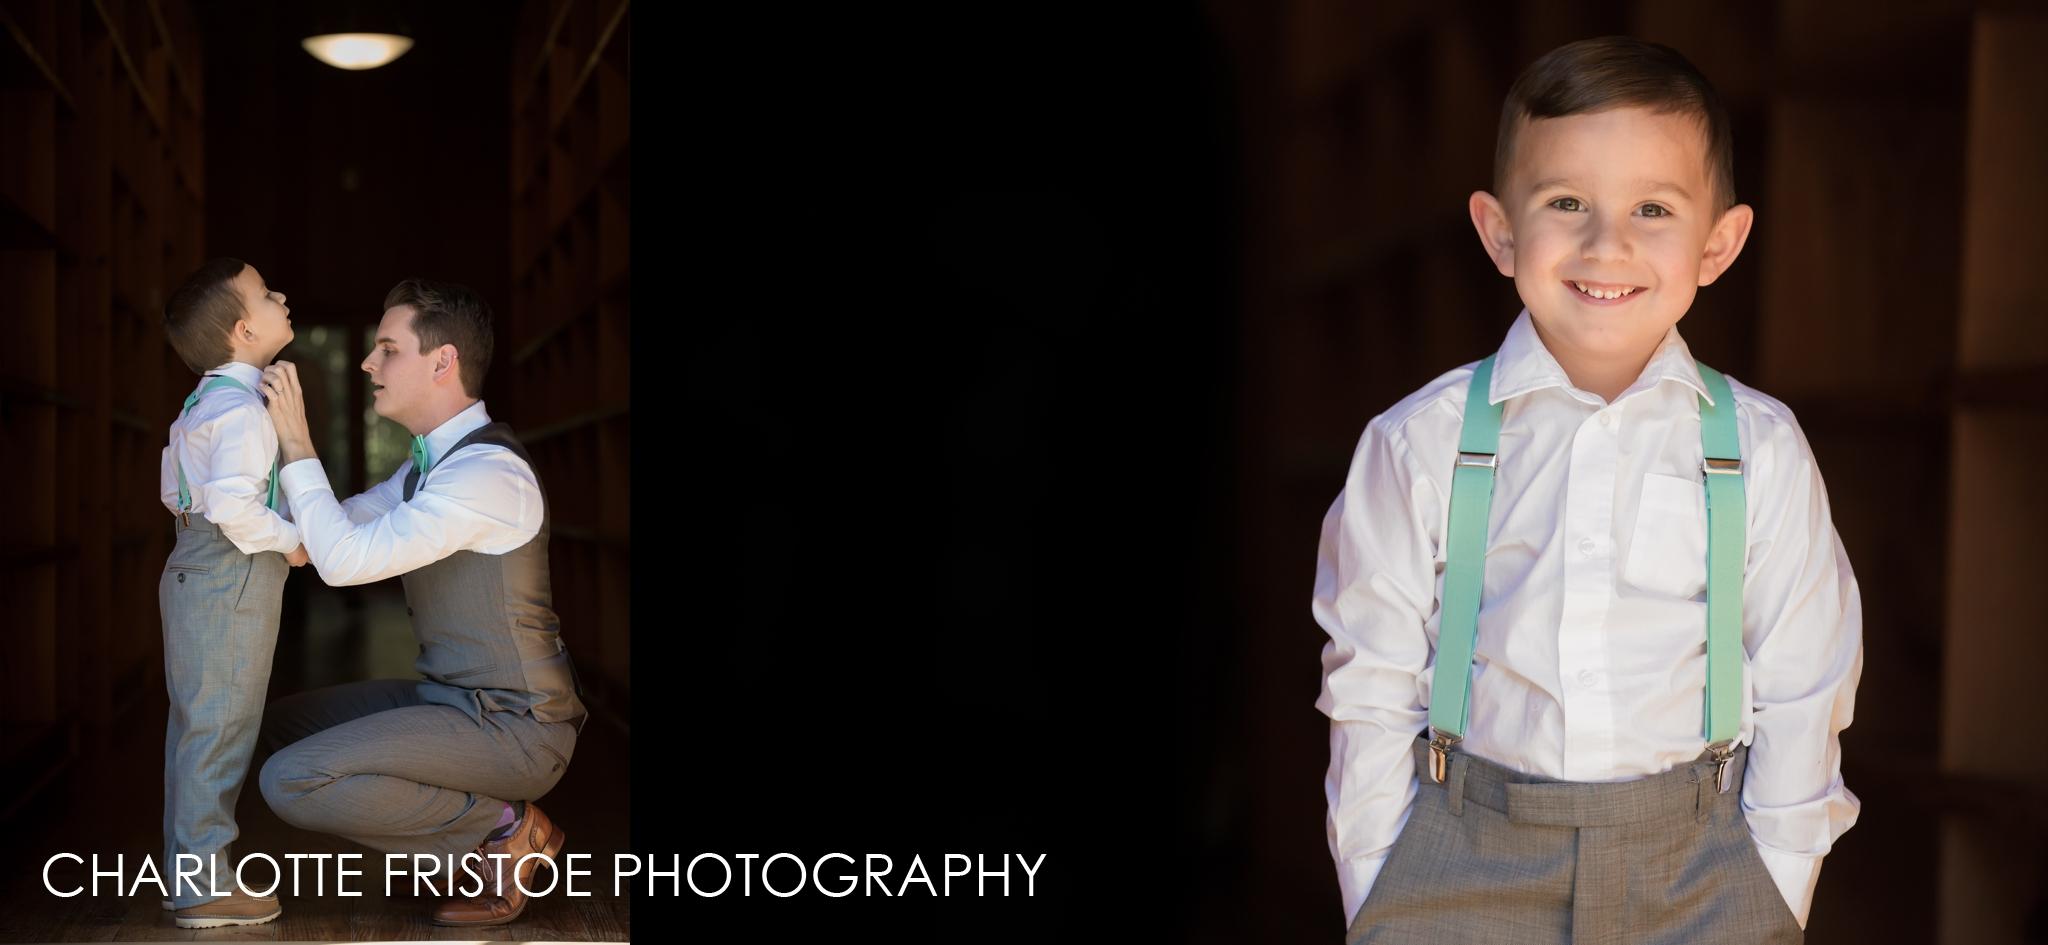 Charlotte Fristoe Tallahassee Wedding Photography-2.jpg